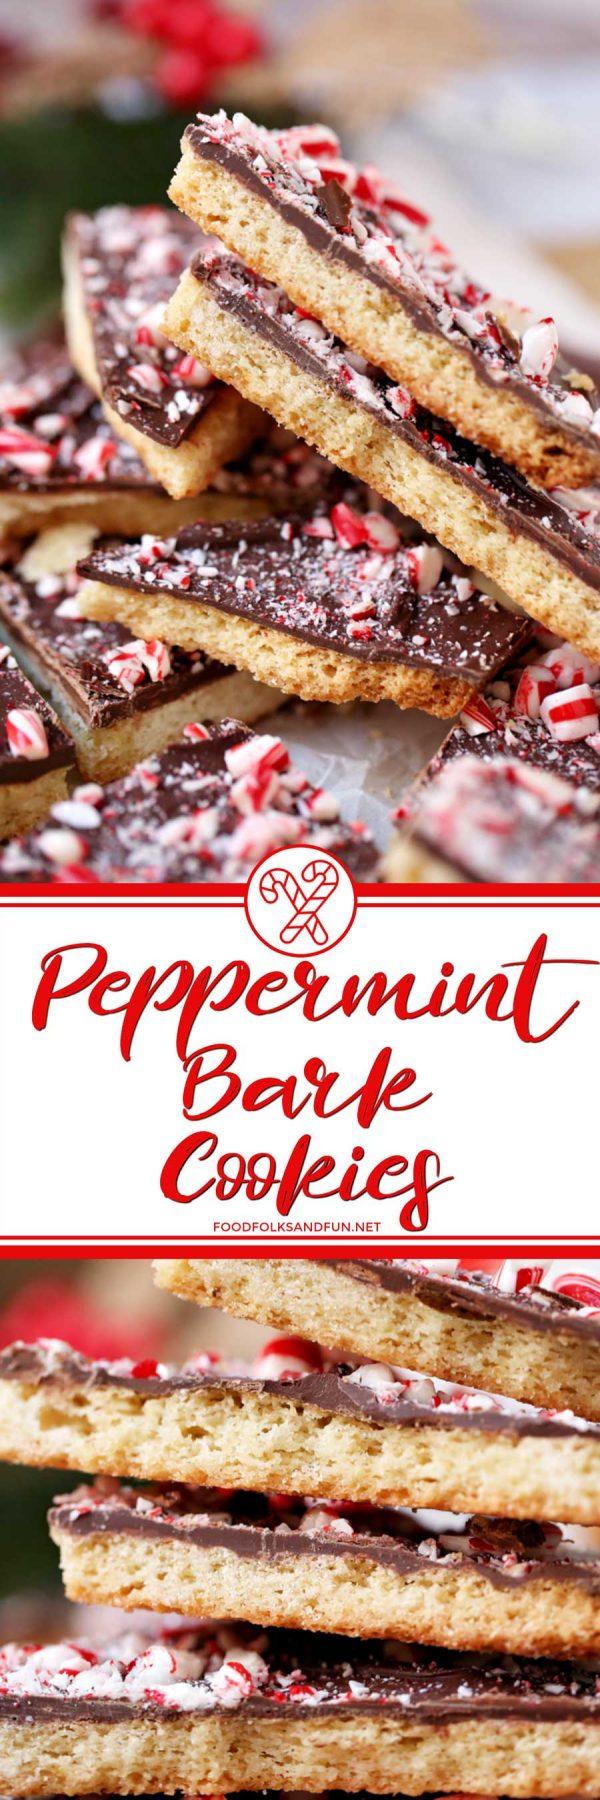 Shortbread Peppermint Bark Cookies